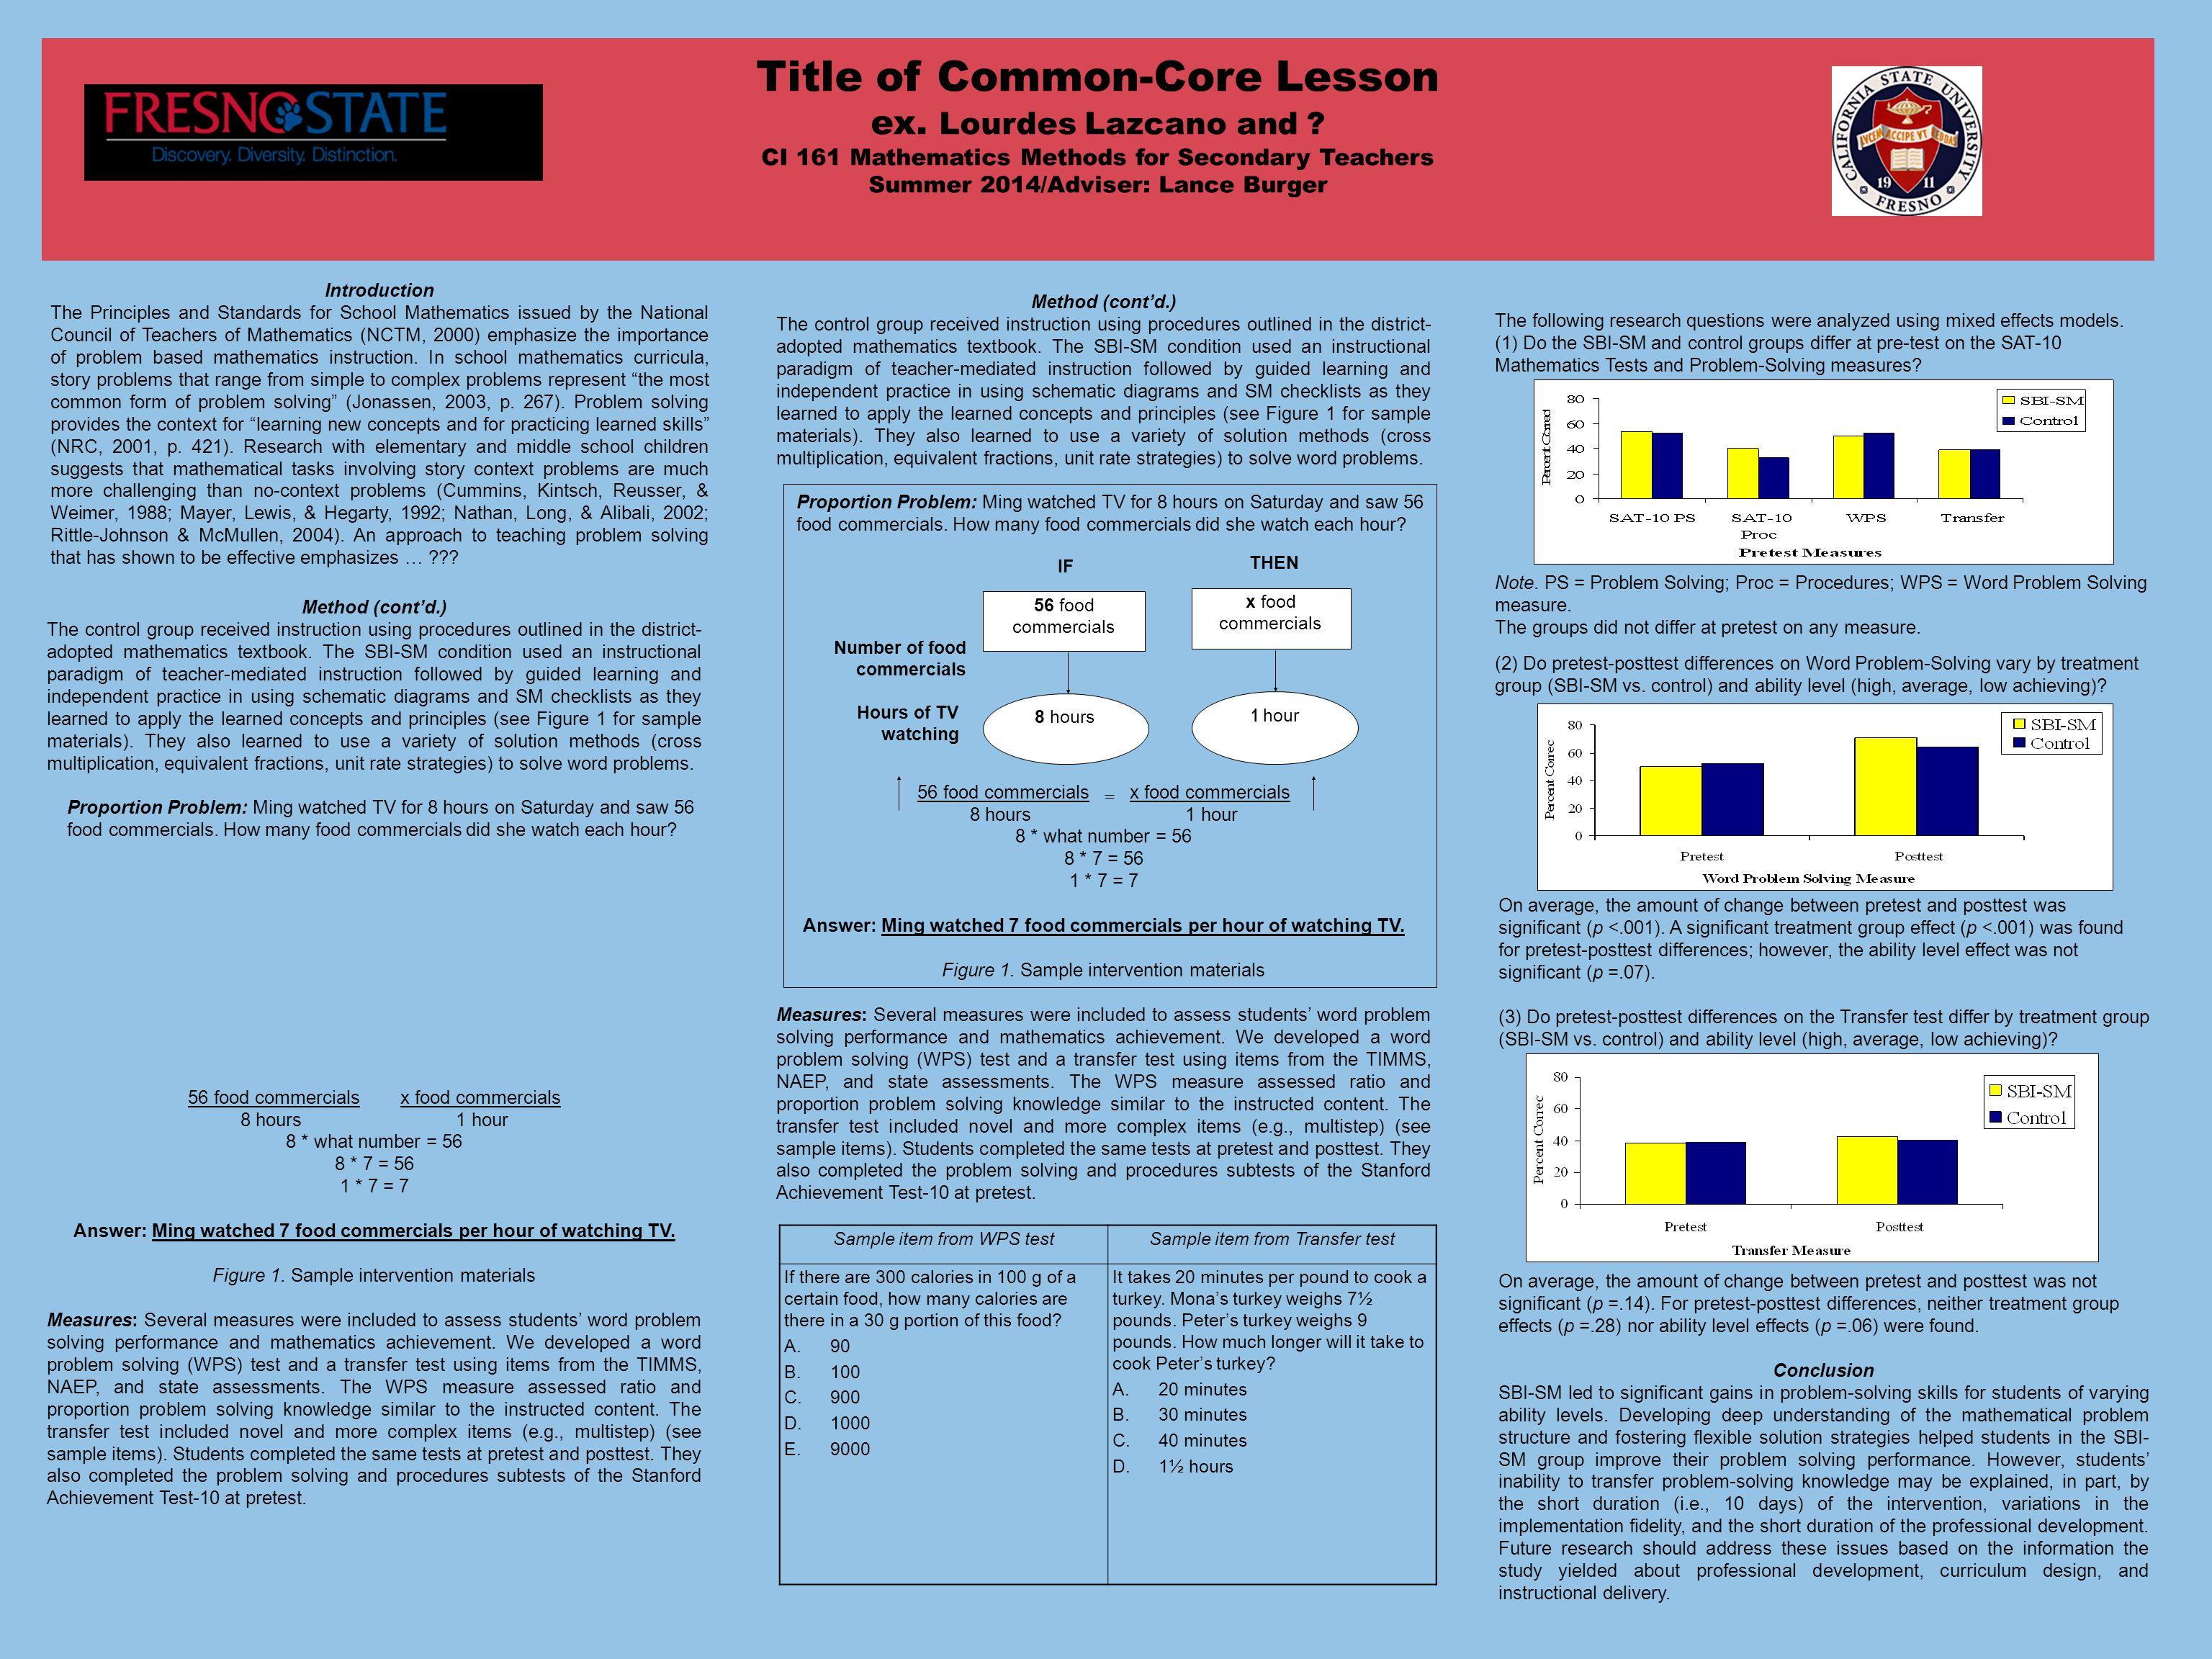 Title of Common-Core Lesson ex. Lourdes Lazcano and .